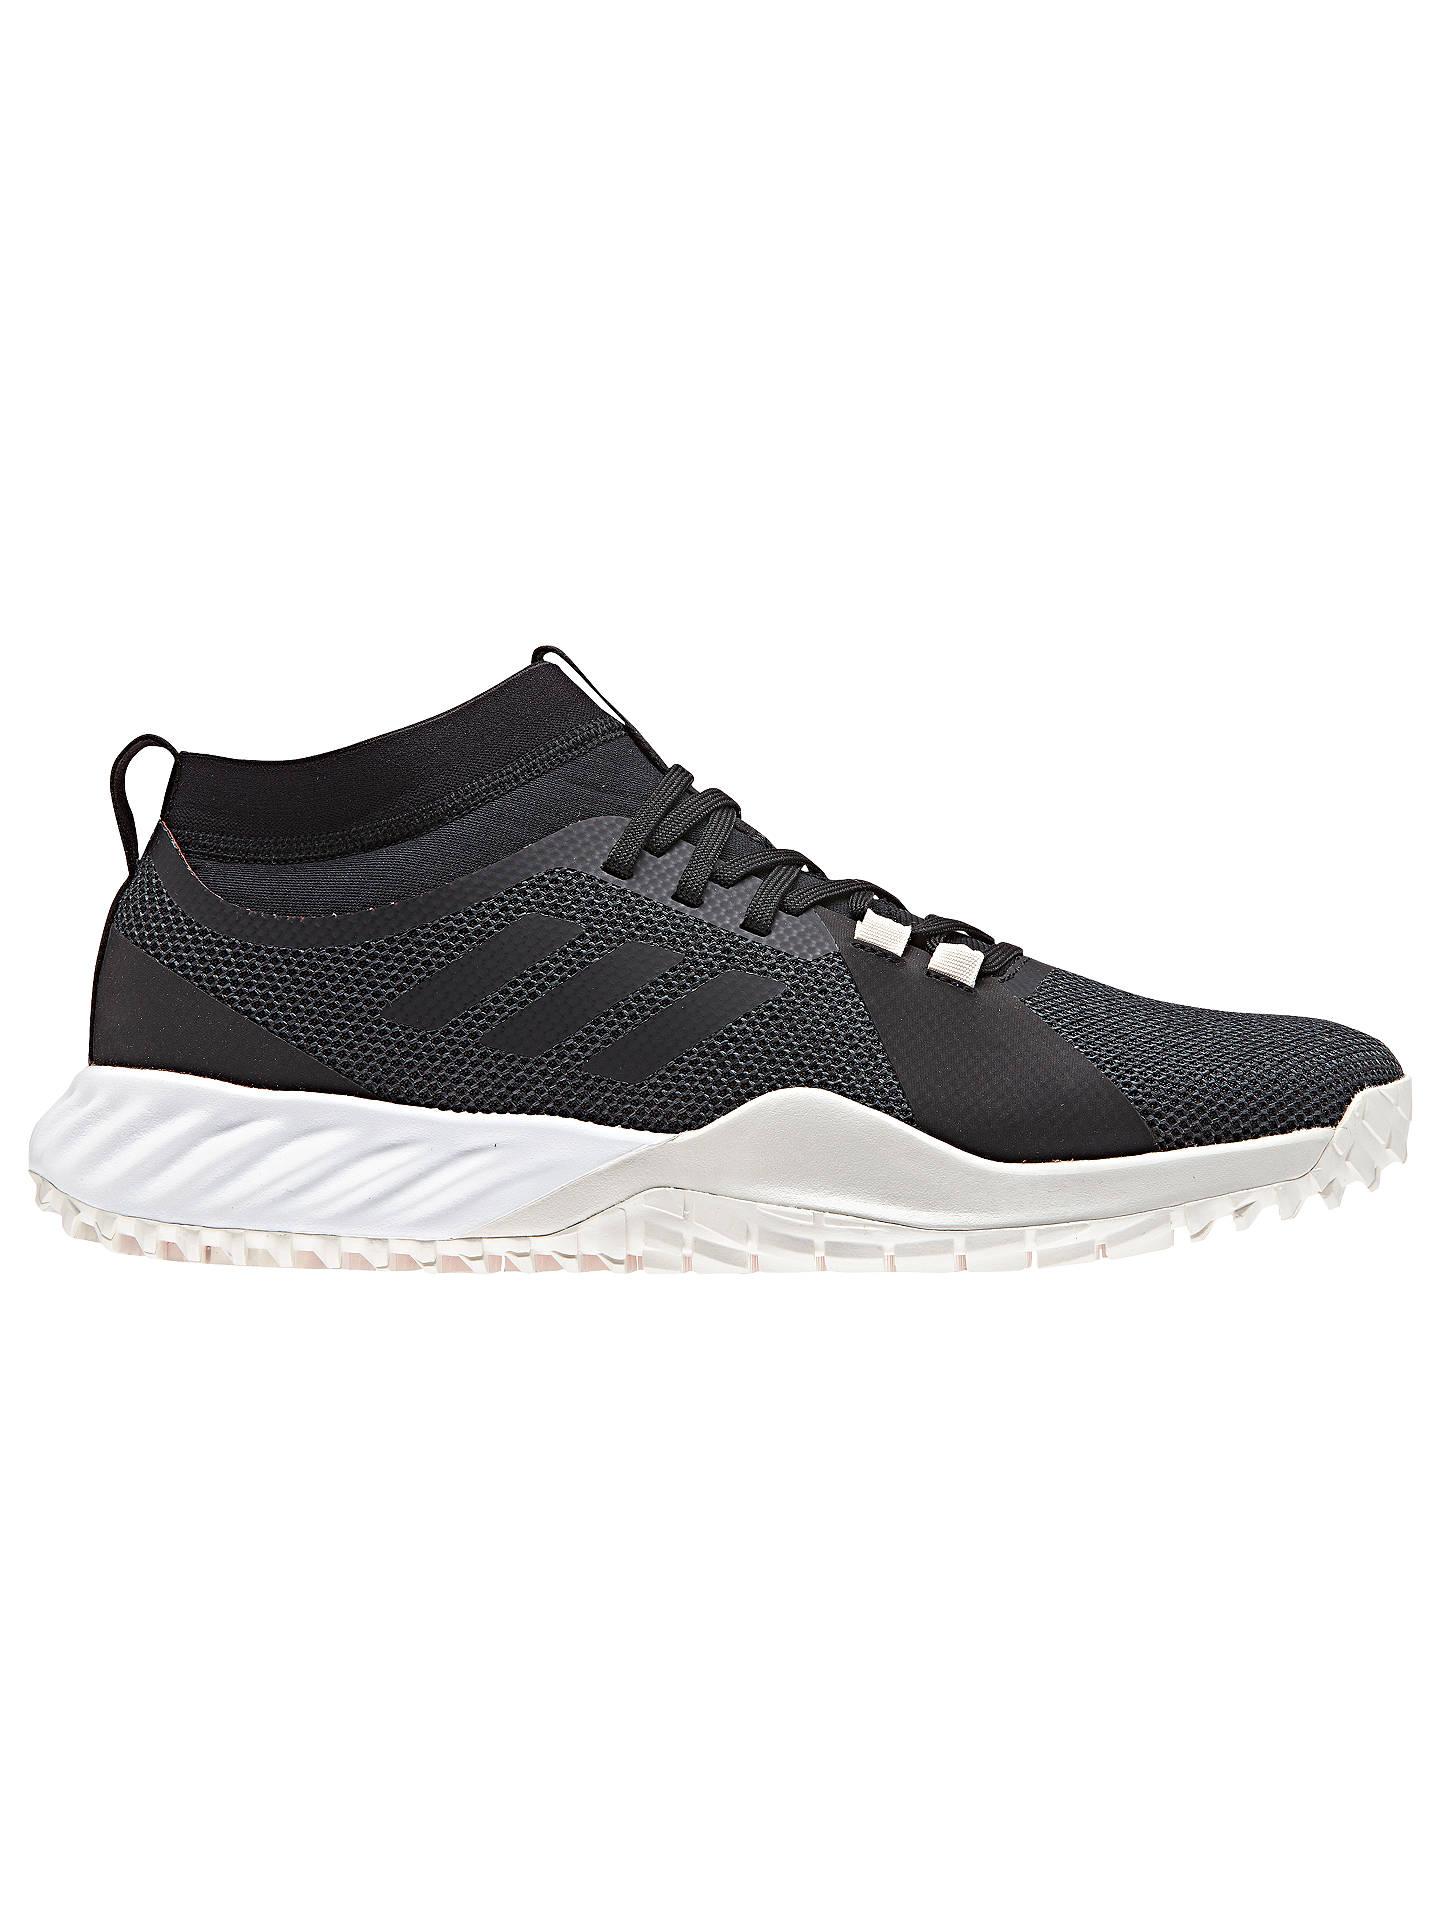 huge discount 6a1e5 307c4 Buyadidas CrazyTrain PRO 3.0 TRF Mens Training Shoes, Carbon, 7 Online at  johnlewis.